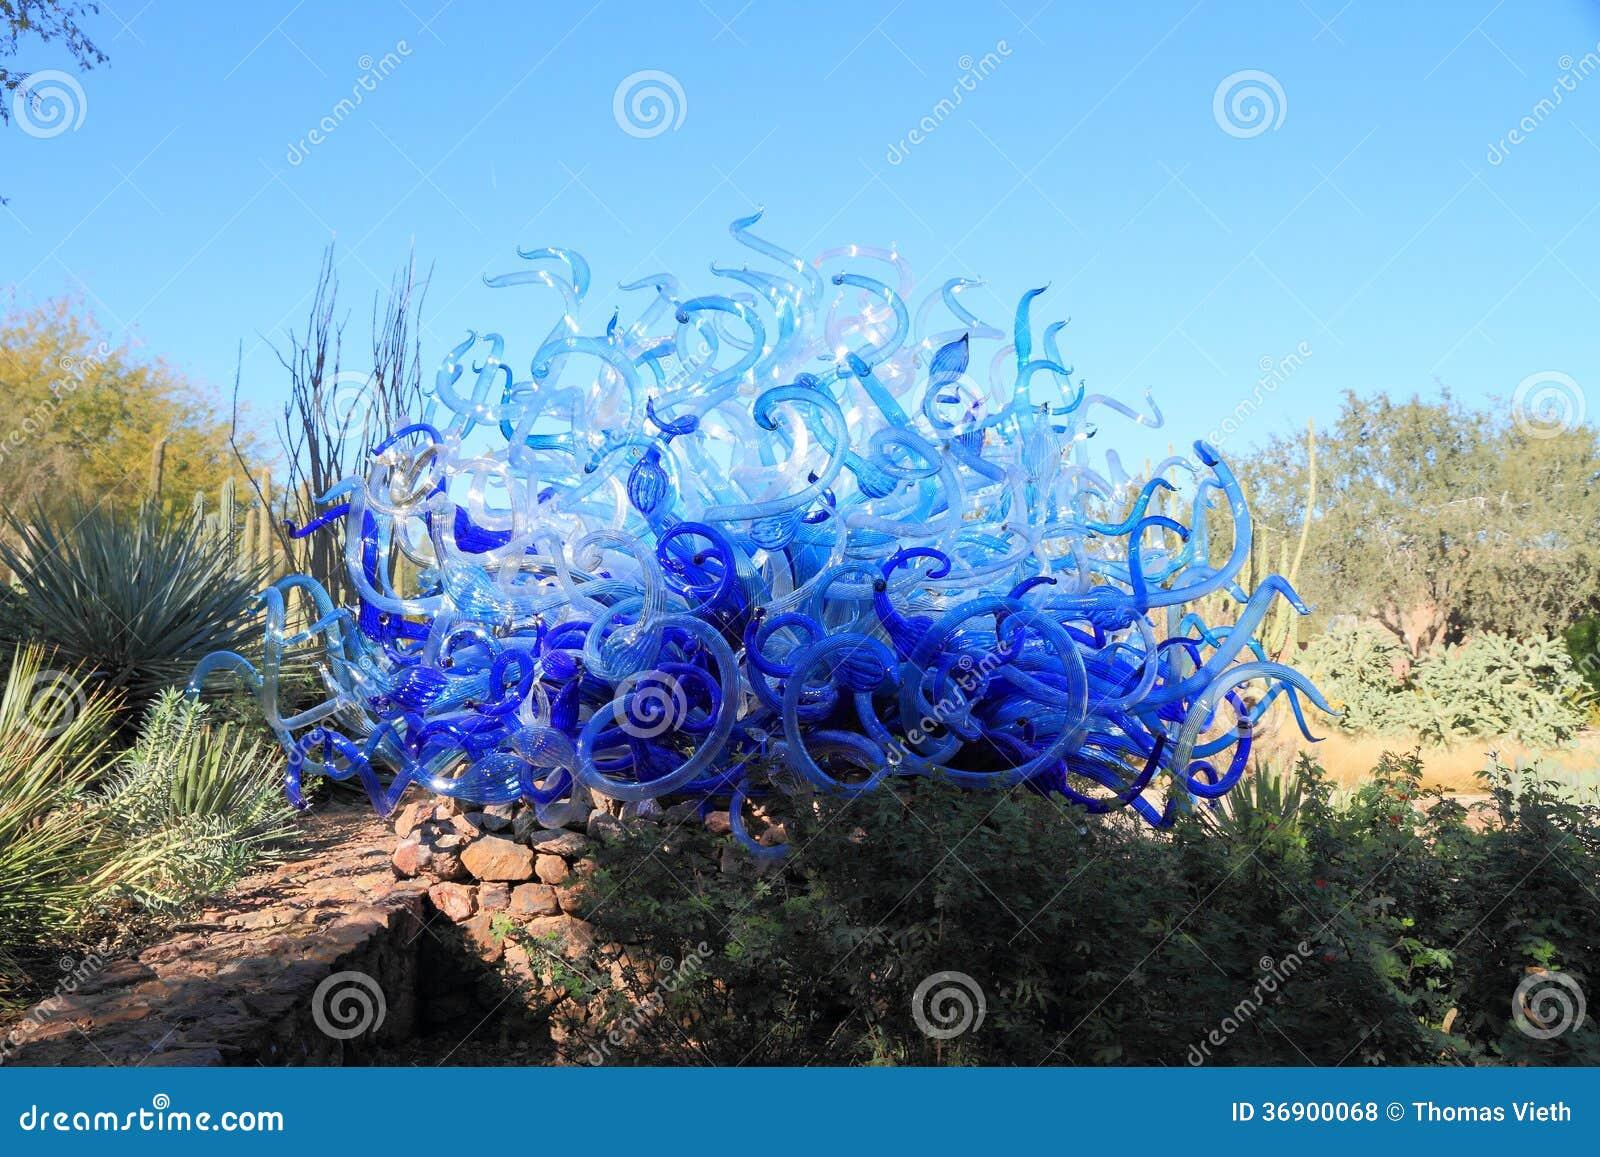 Usa Phoenix Arizona Chihuly Exhibit Blue Fiori Sun